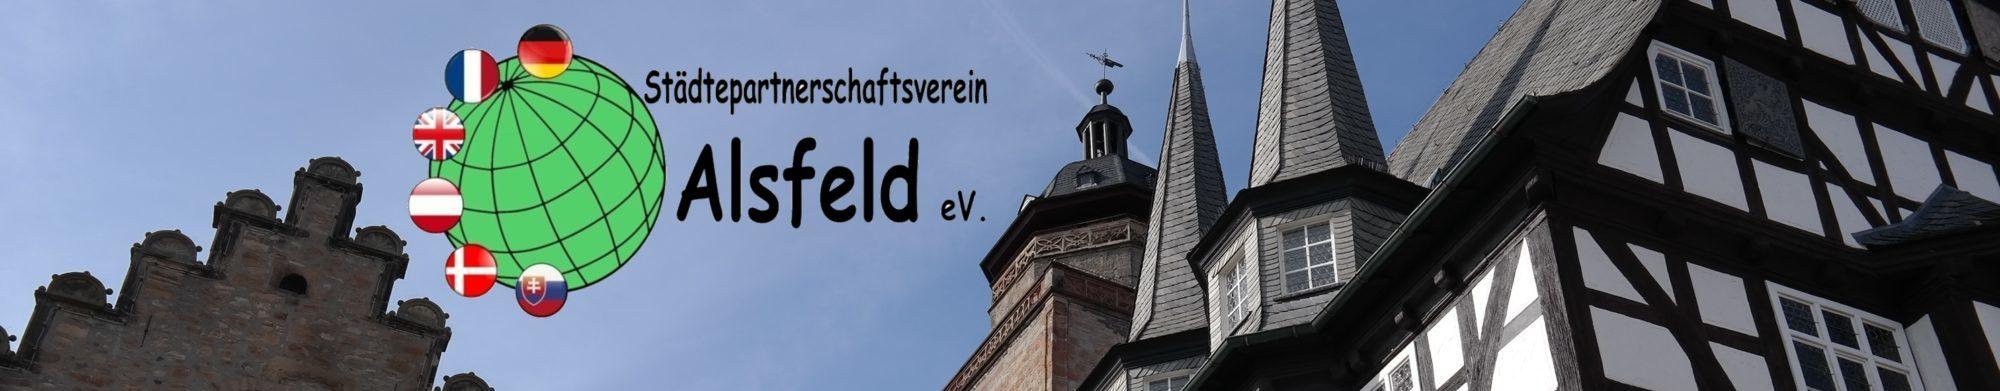 Städtepartnerschaftsverein Alsfeld e.V.